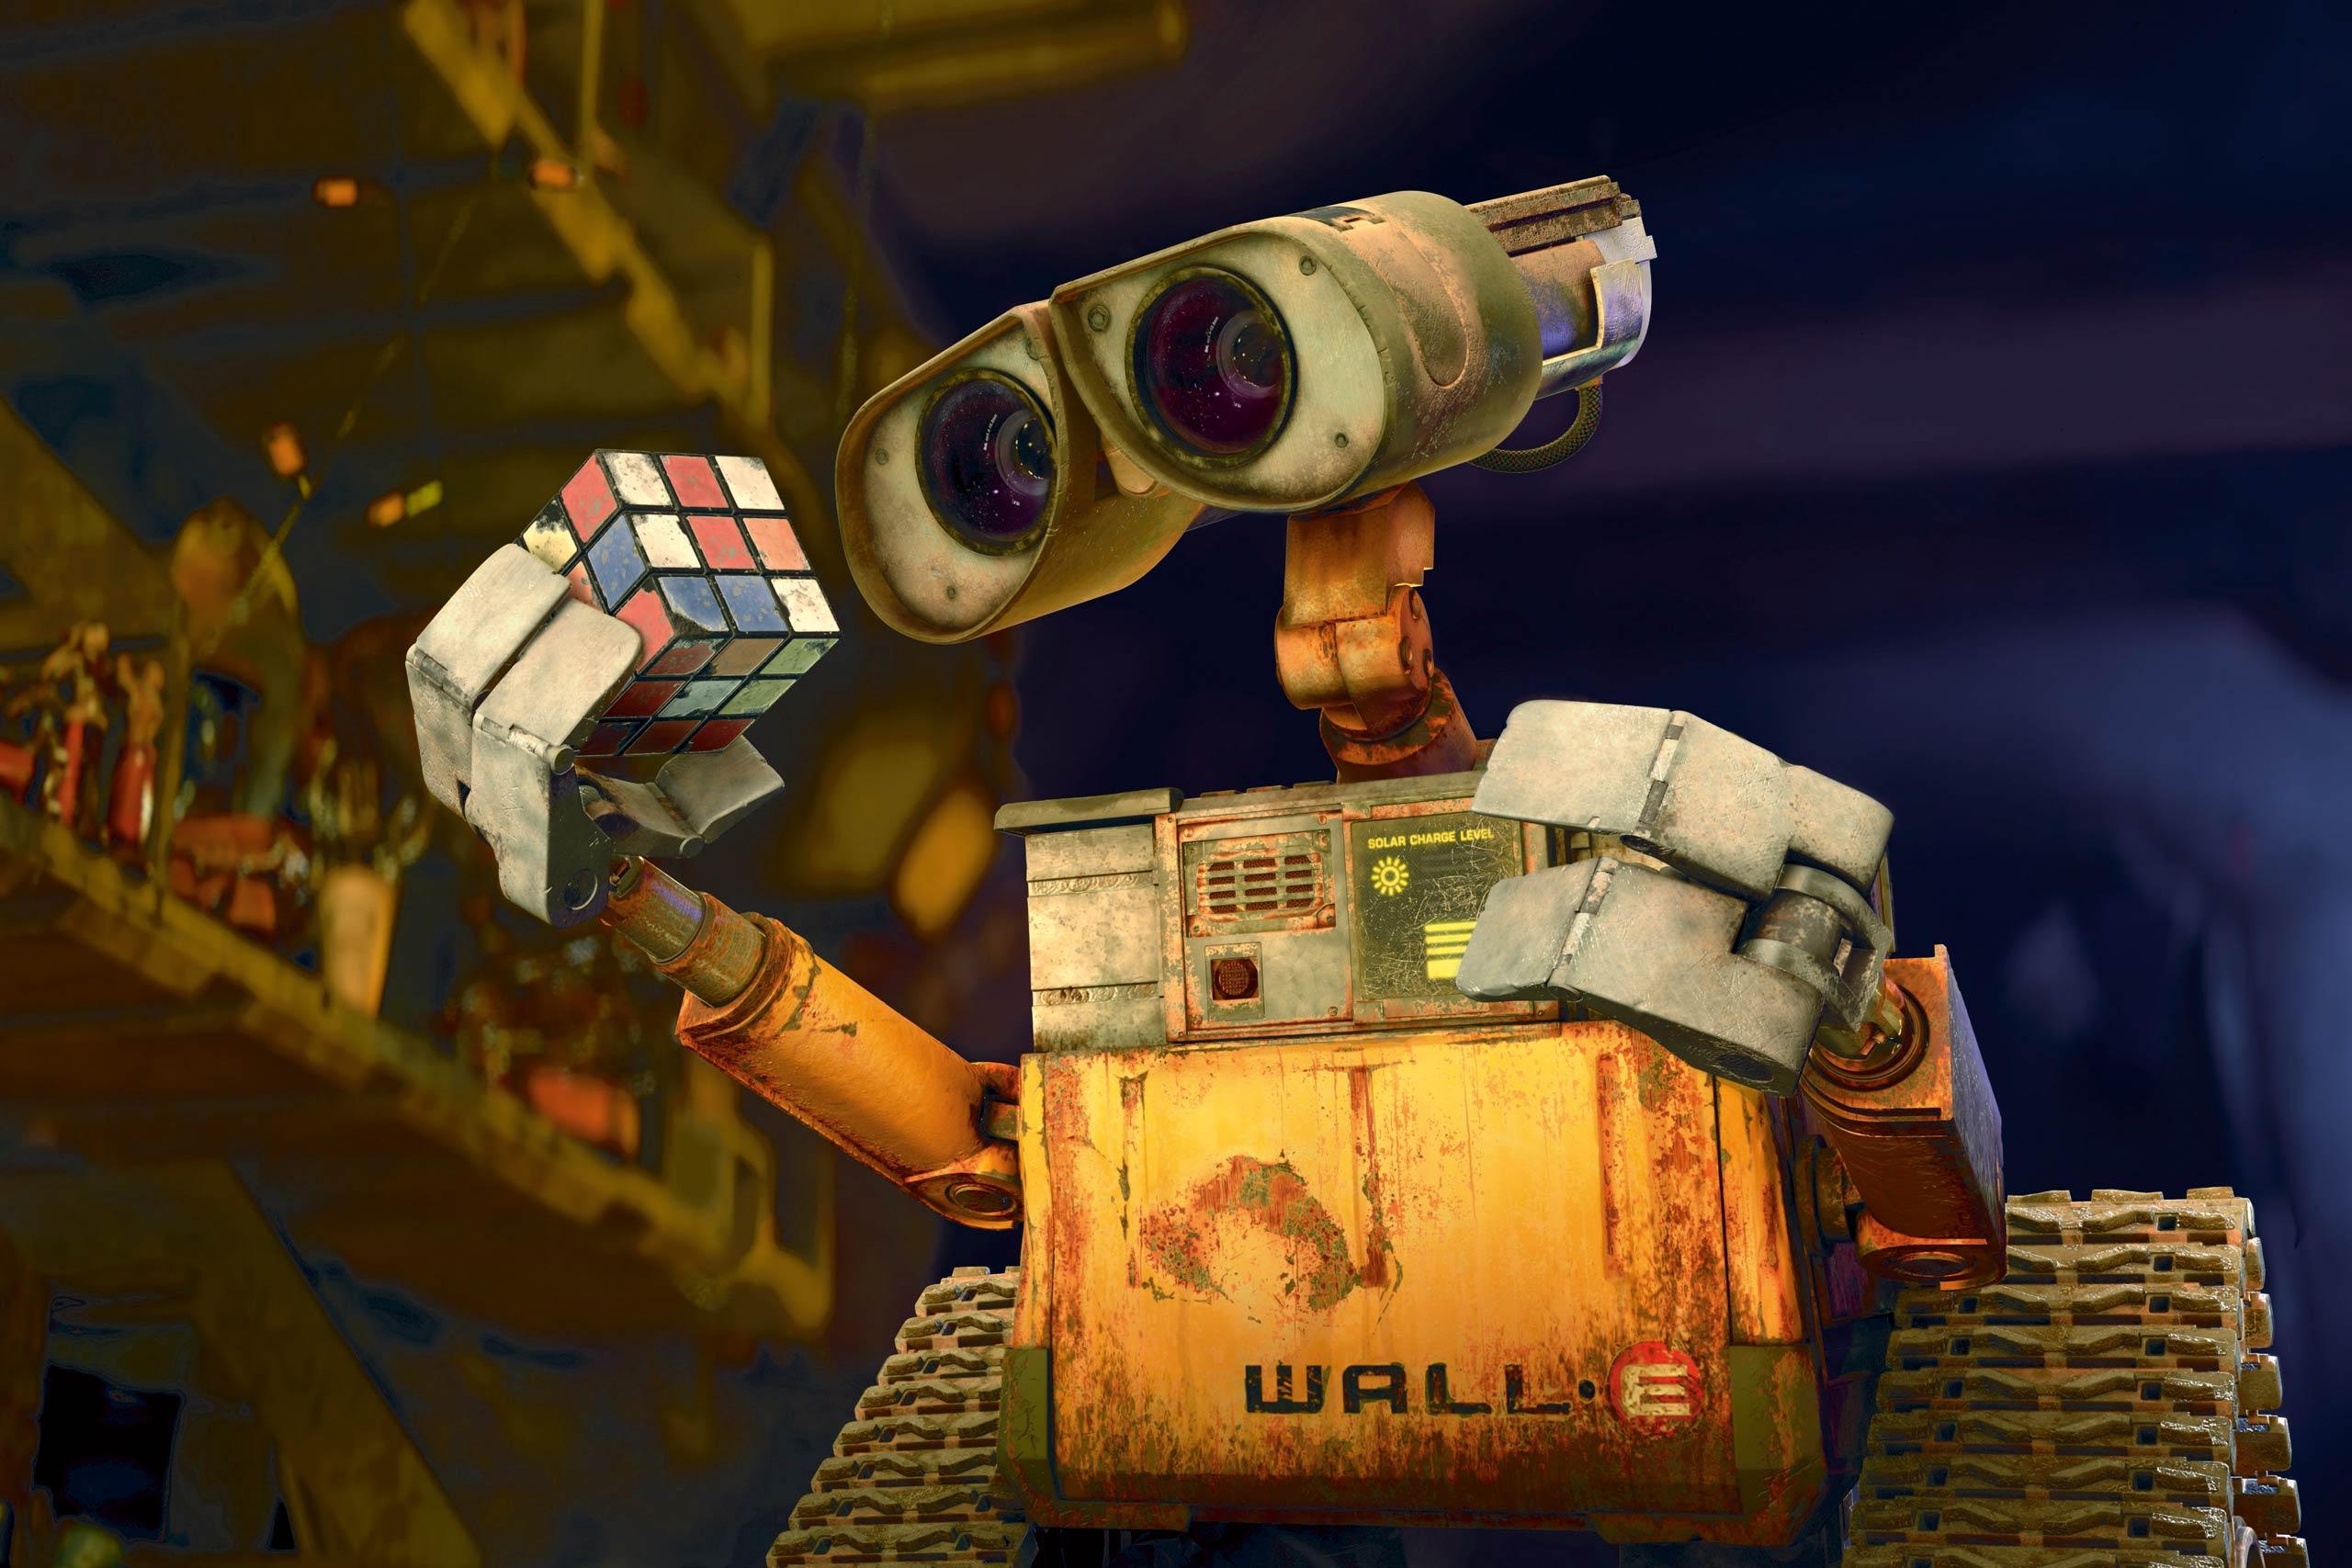 <strong>Wall-E – <i>Wall-E</i>, 2008</strong>